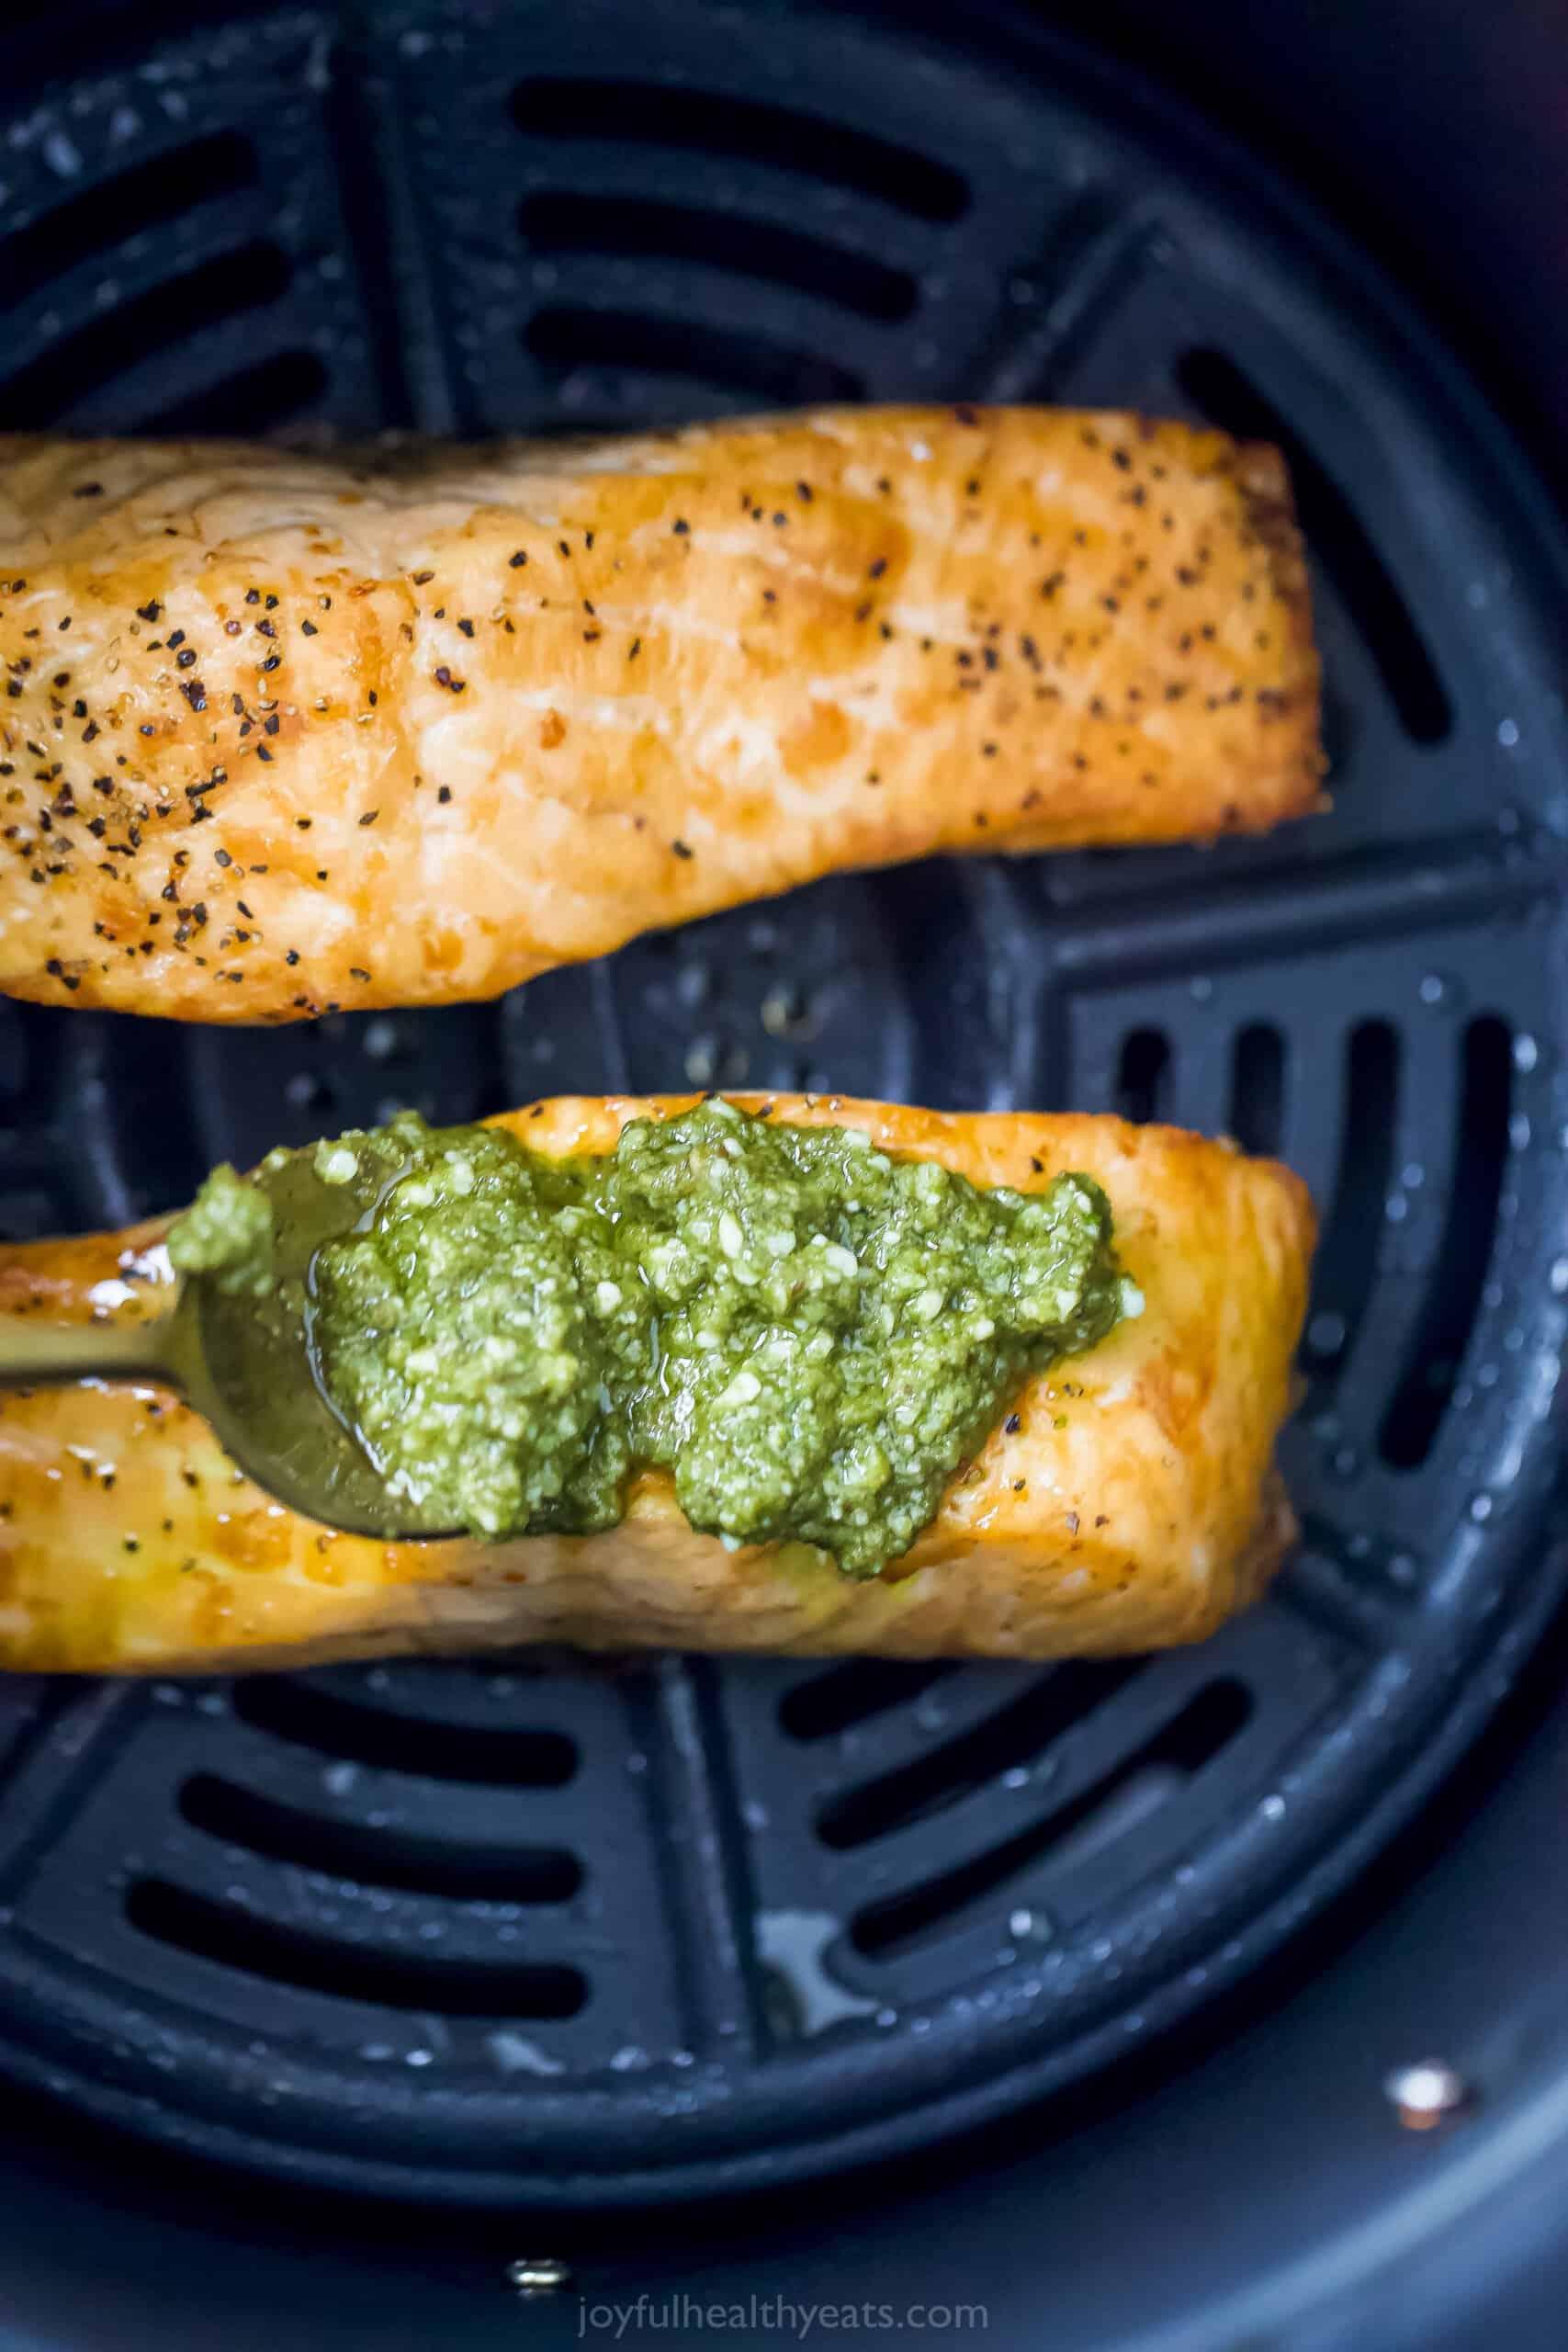 pesto being spread on salmon in air fryer